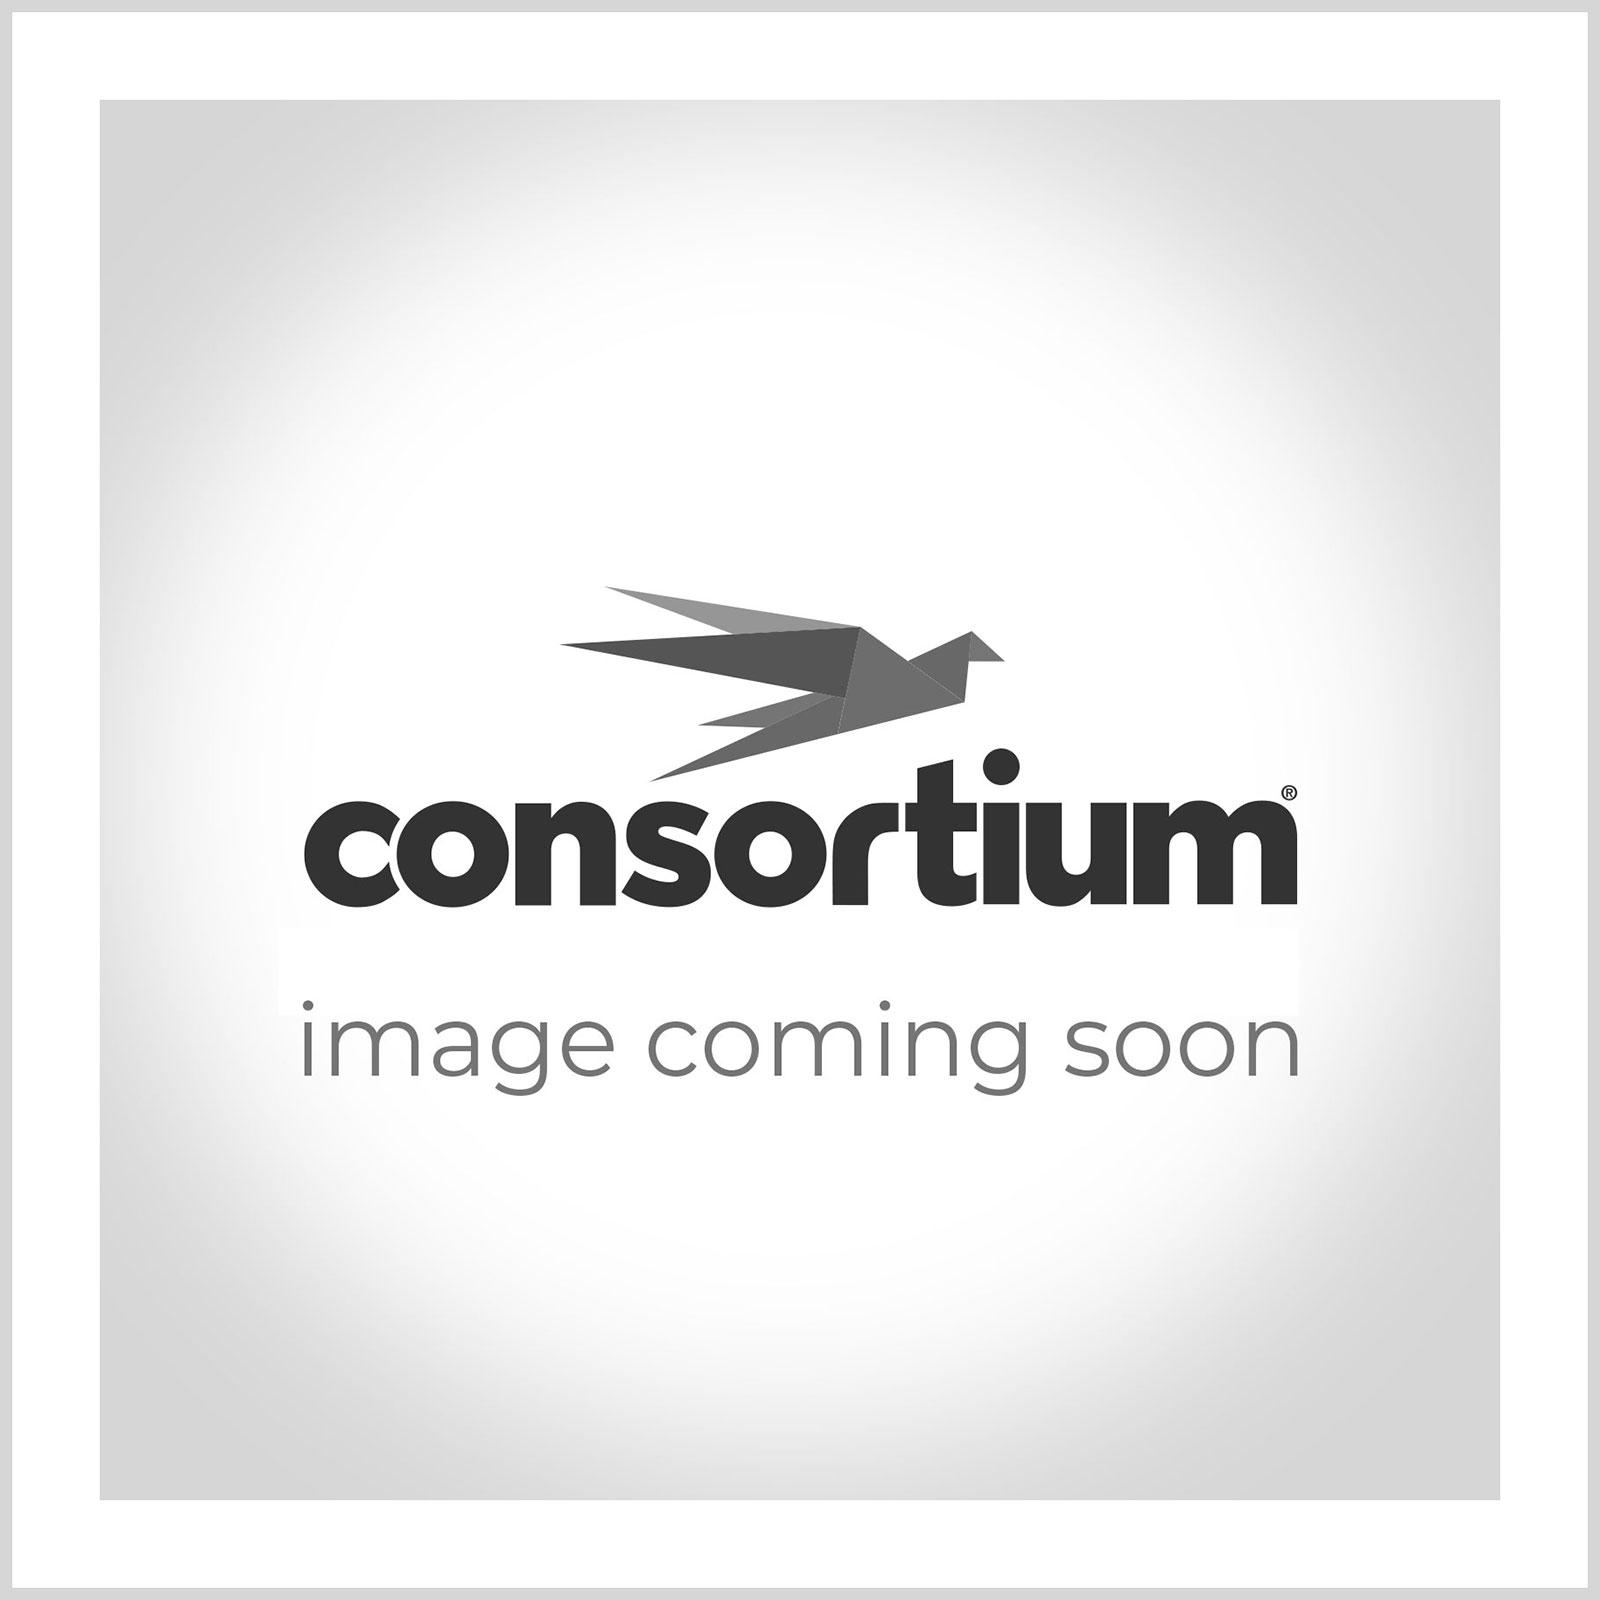 Consortium Superlight Mini Whiteboard Portrait Lined Kit